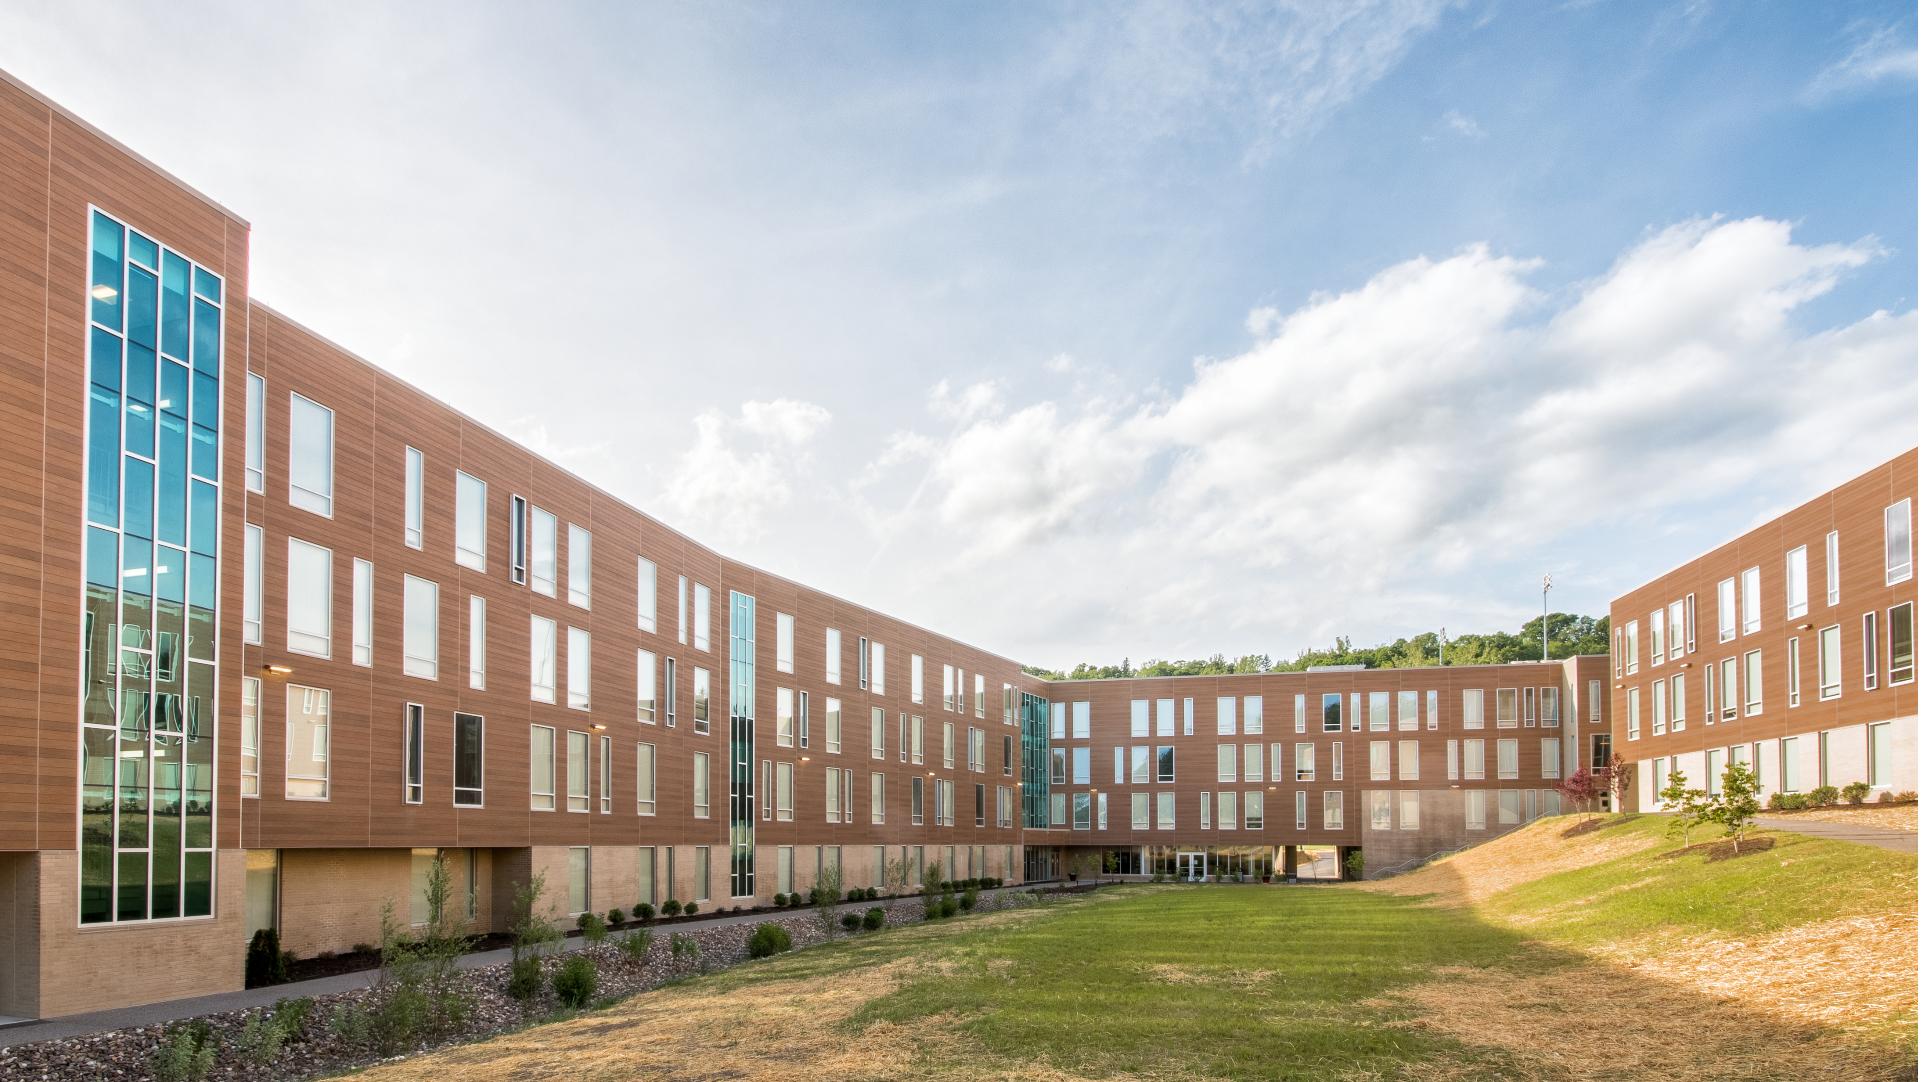 University Terrace Fairmont State University Kalkreuth